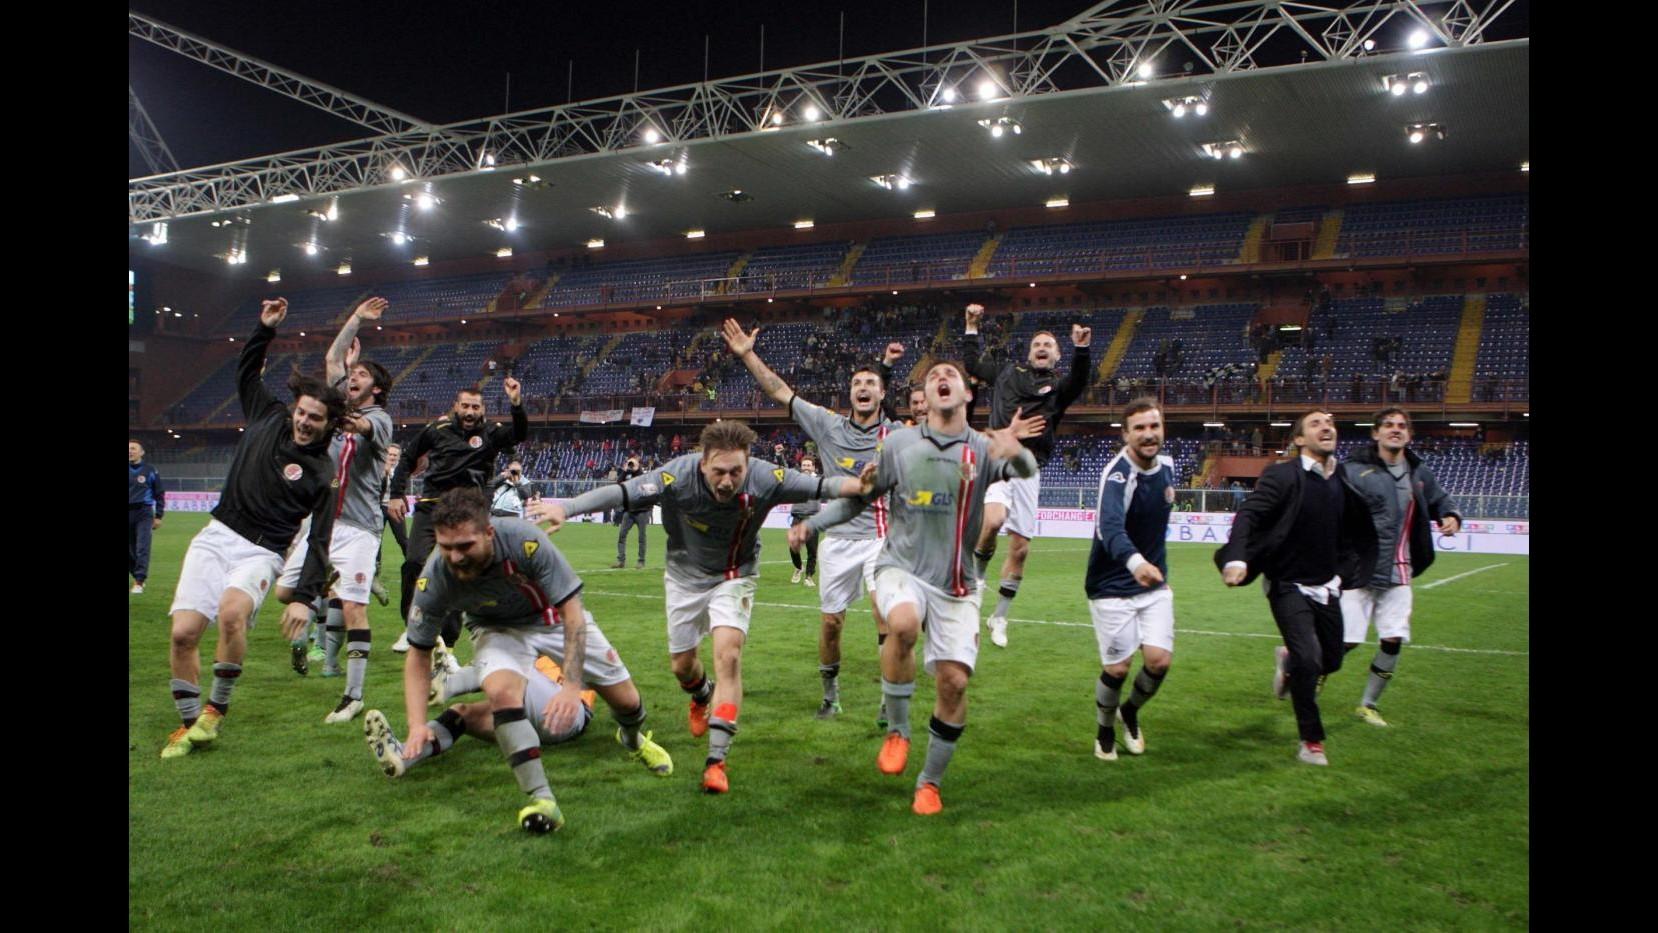 Coppa Italia, Alessandria firma l'impresa: Genoa ko 2-1, Grigi ai quarti